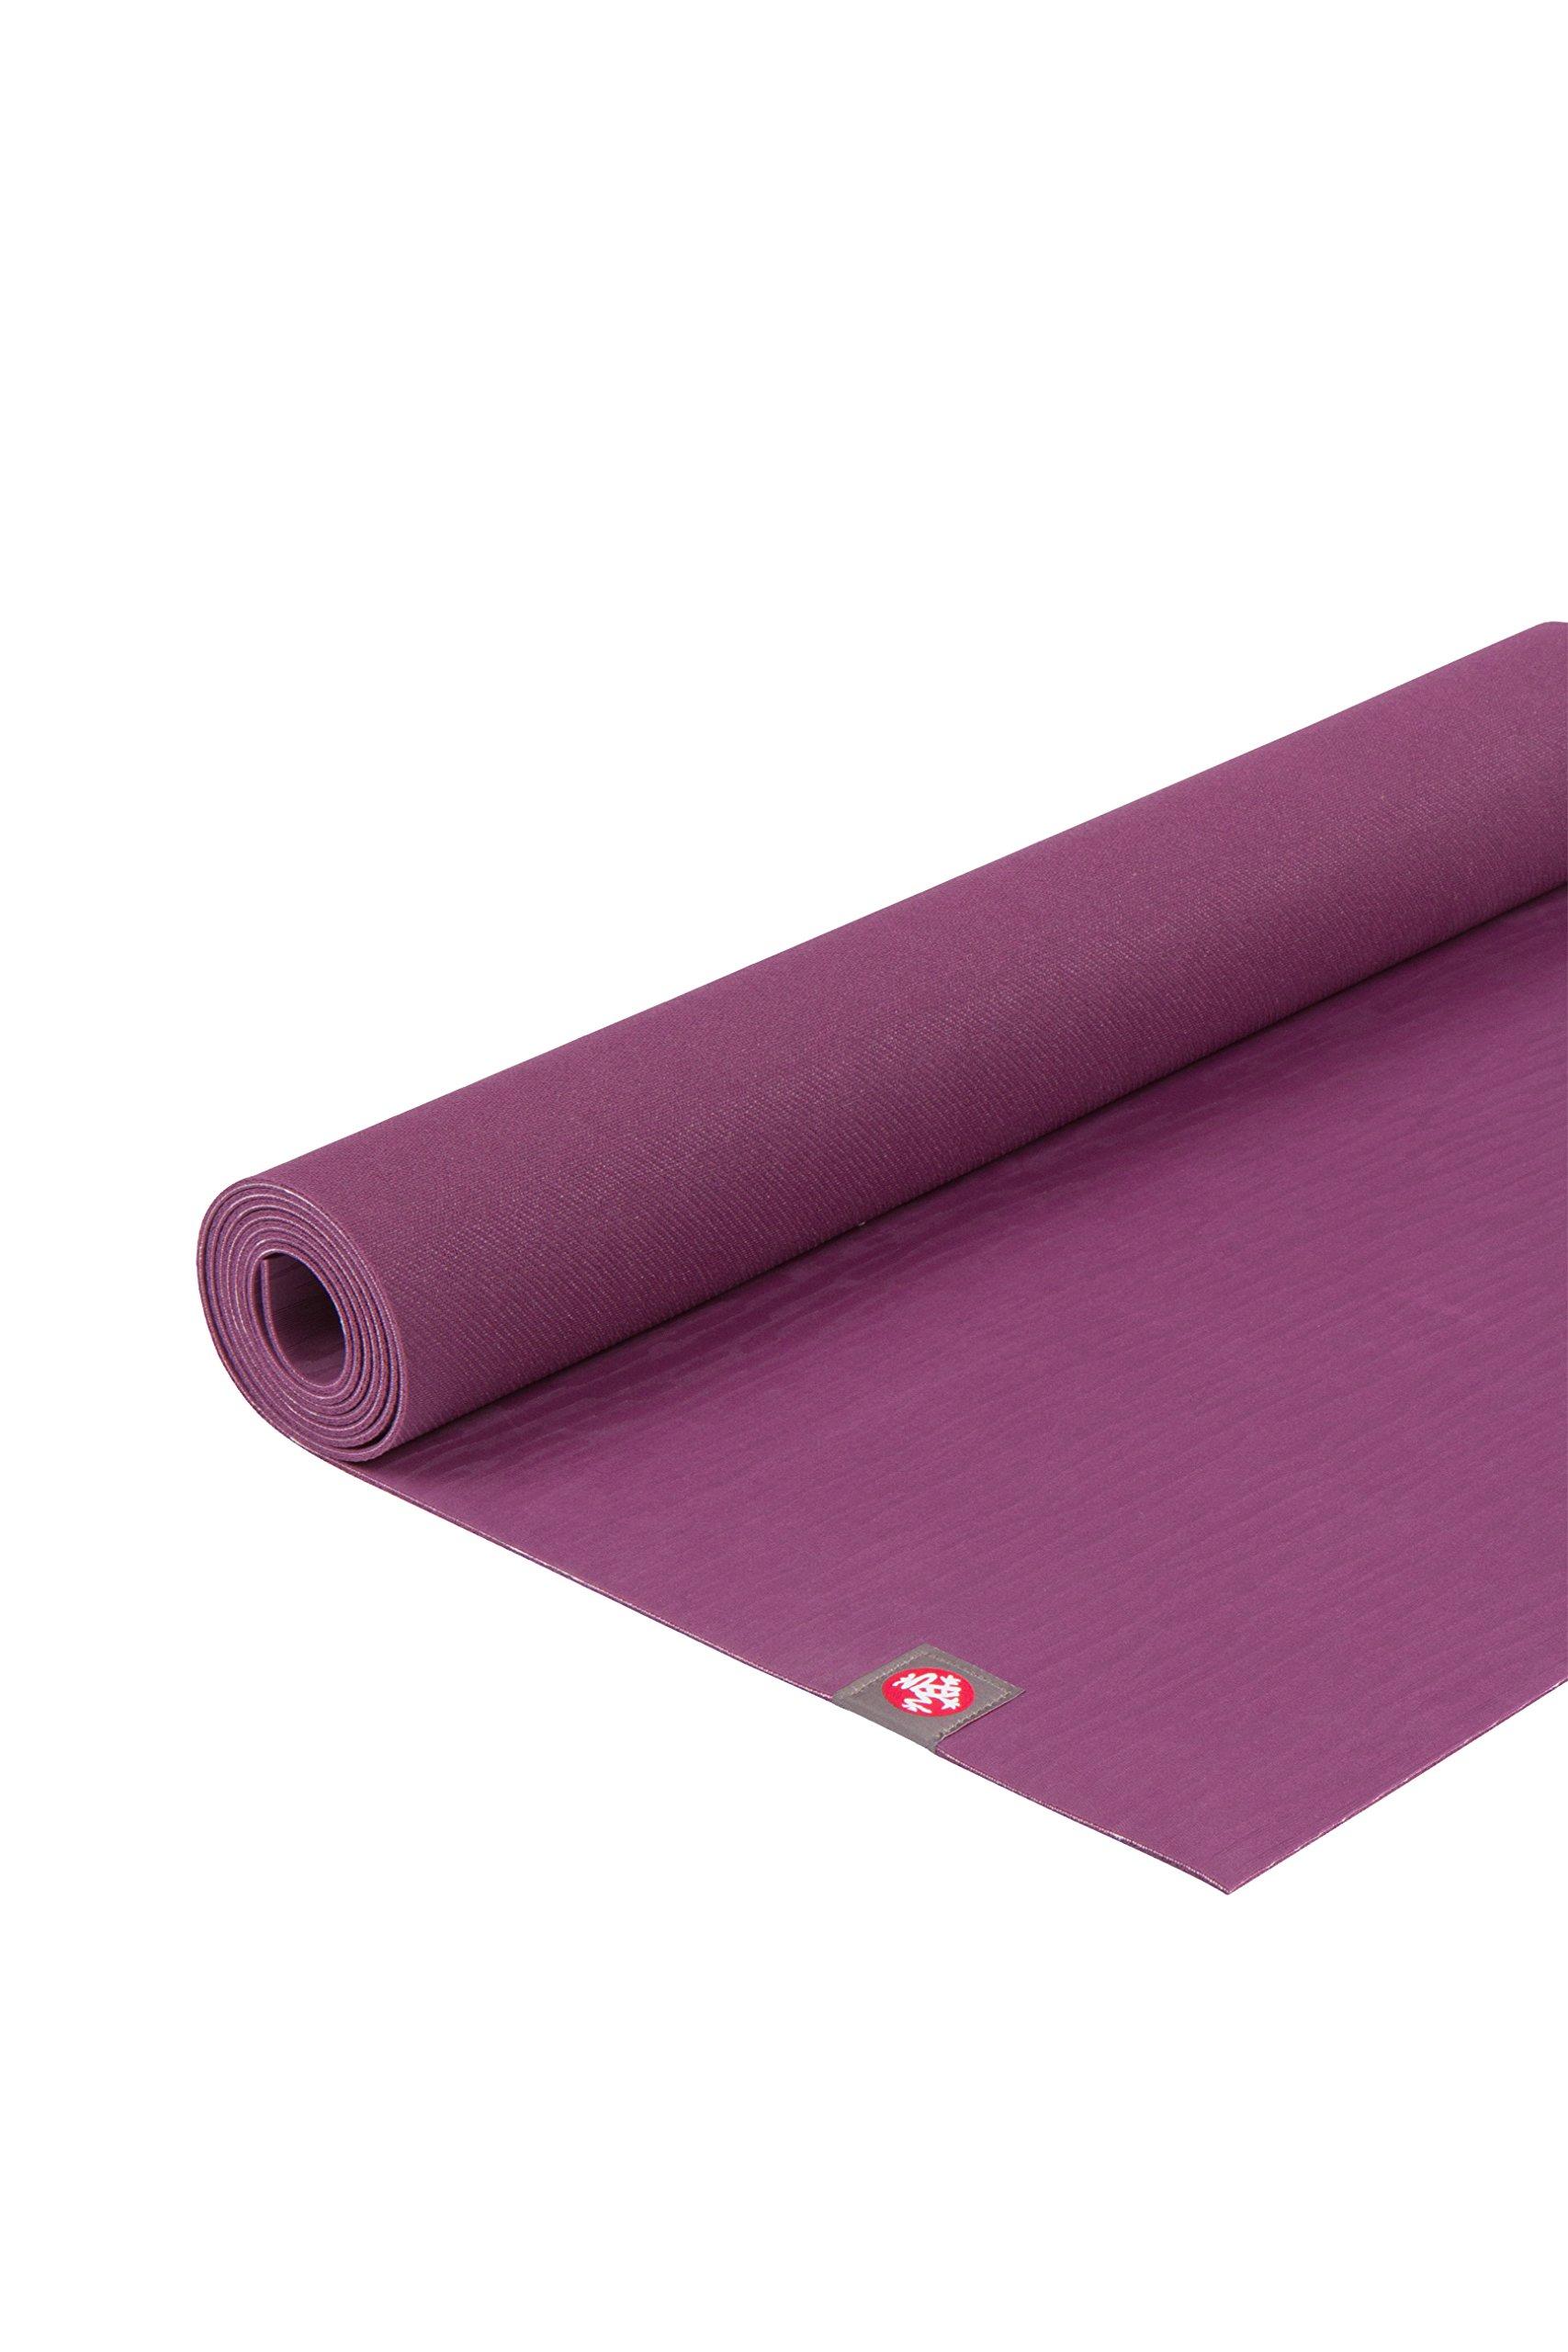 Manduka - EKO Lite - Fitness/Yoga - Acai product image